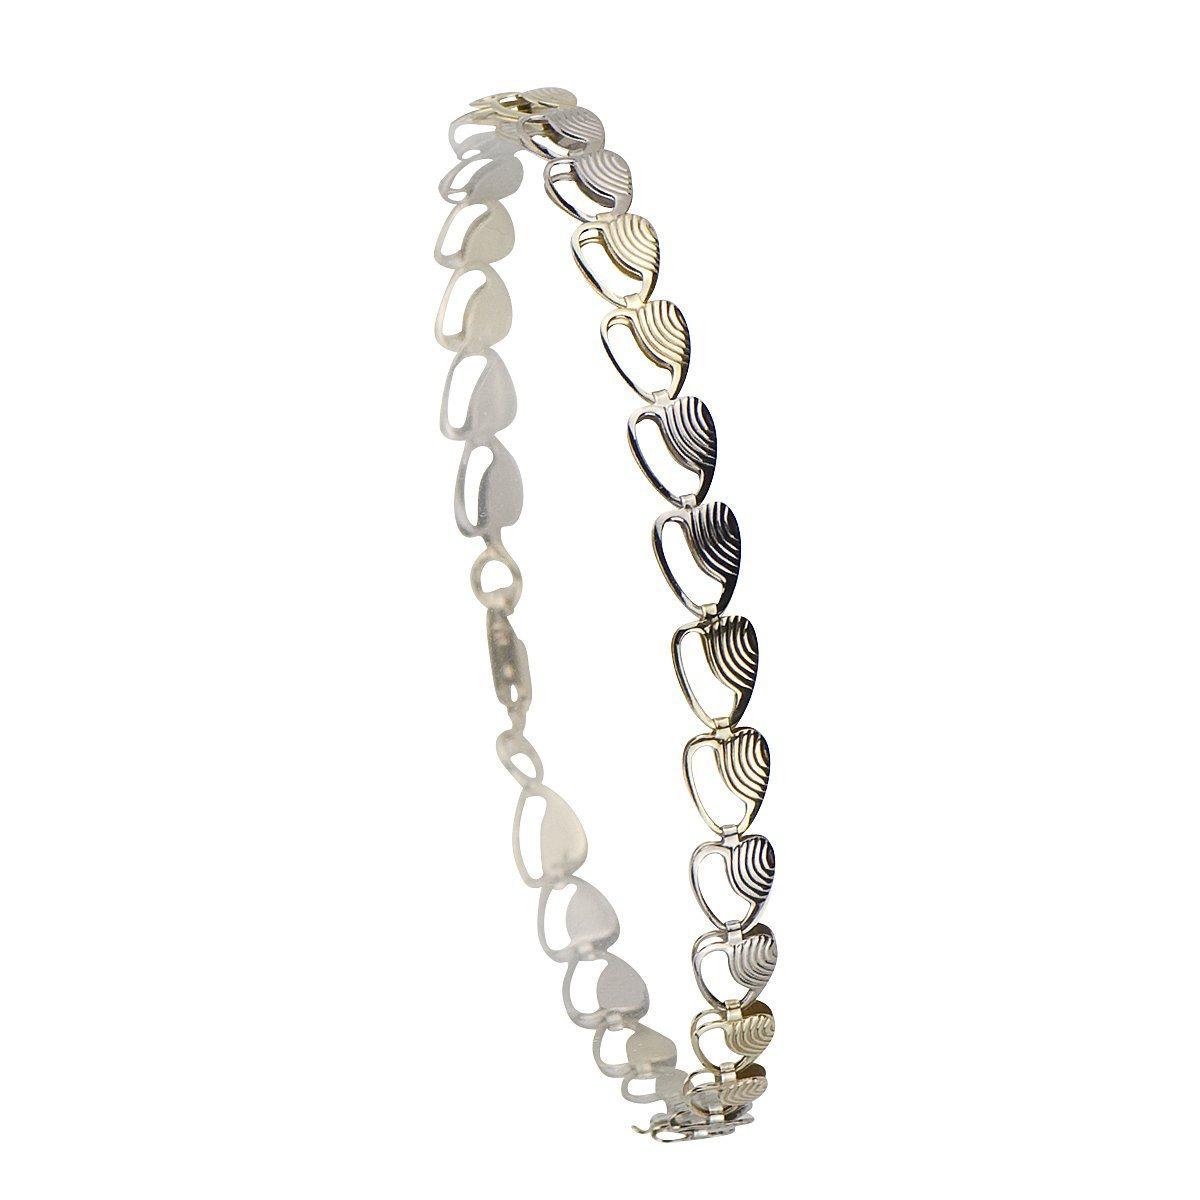 Firetti Armband 333/- Gelbgold bicolor | Schmuck > Armbänder > Goldarmbänder | Bunt | Firetti